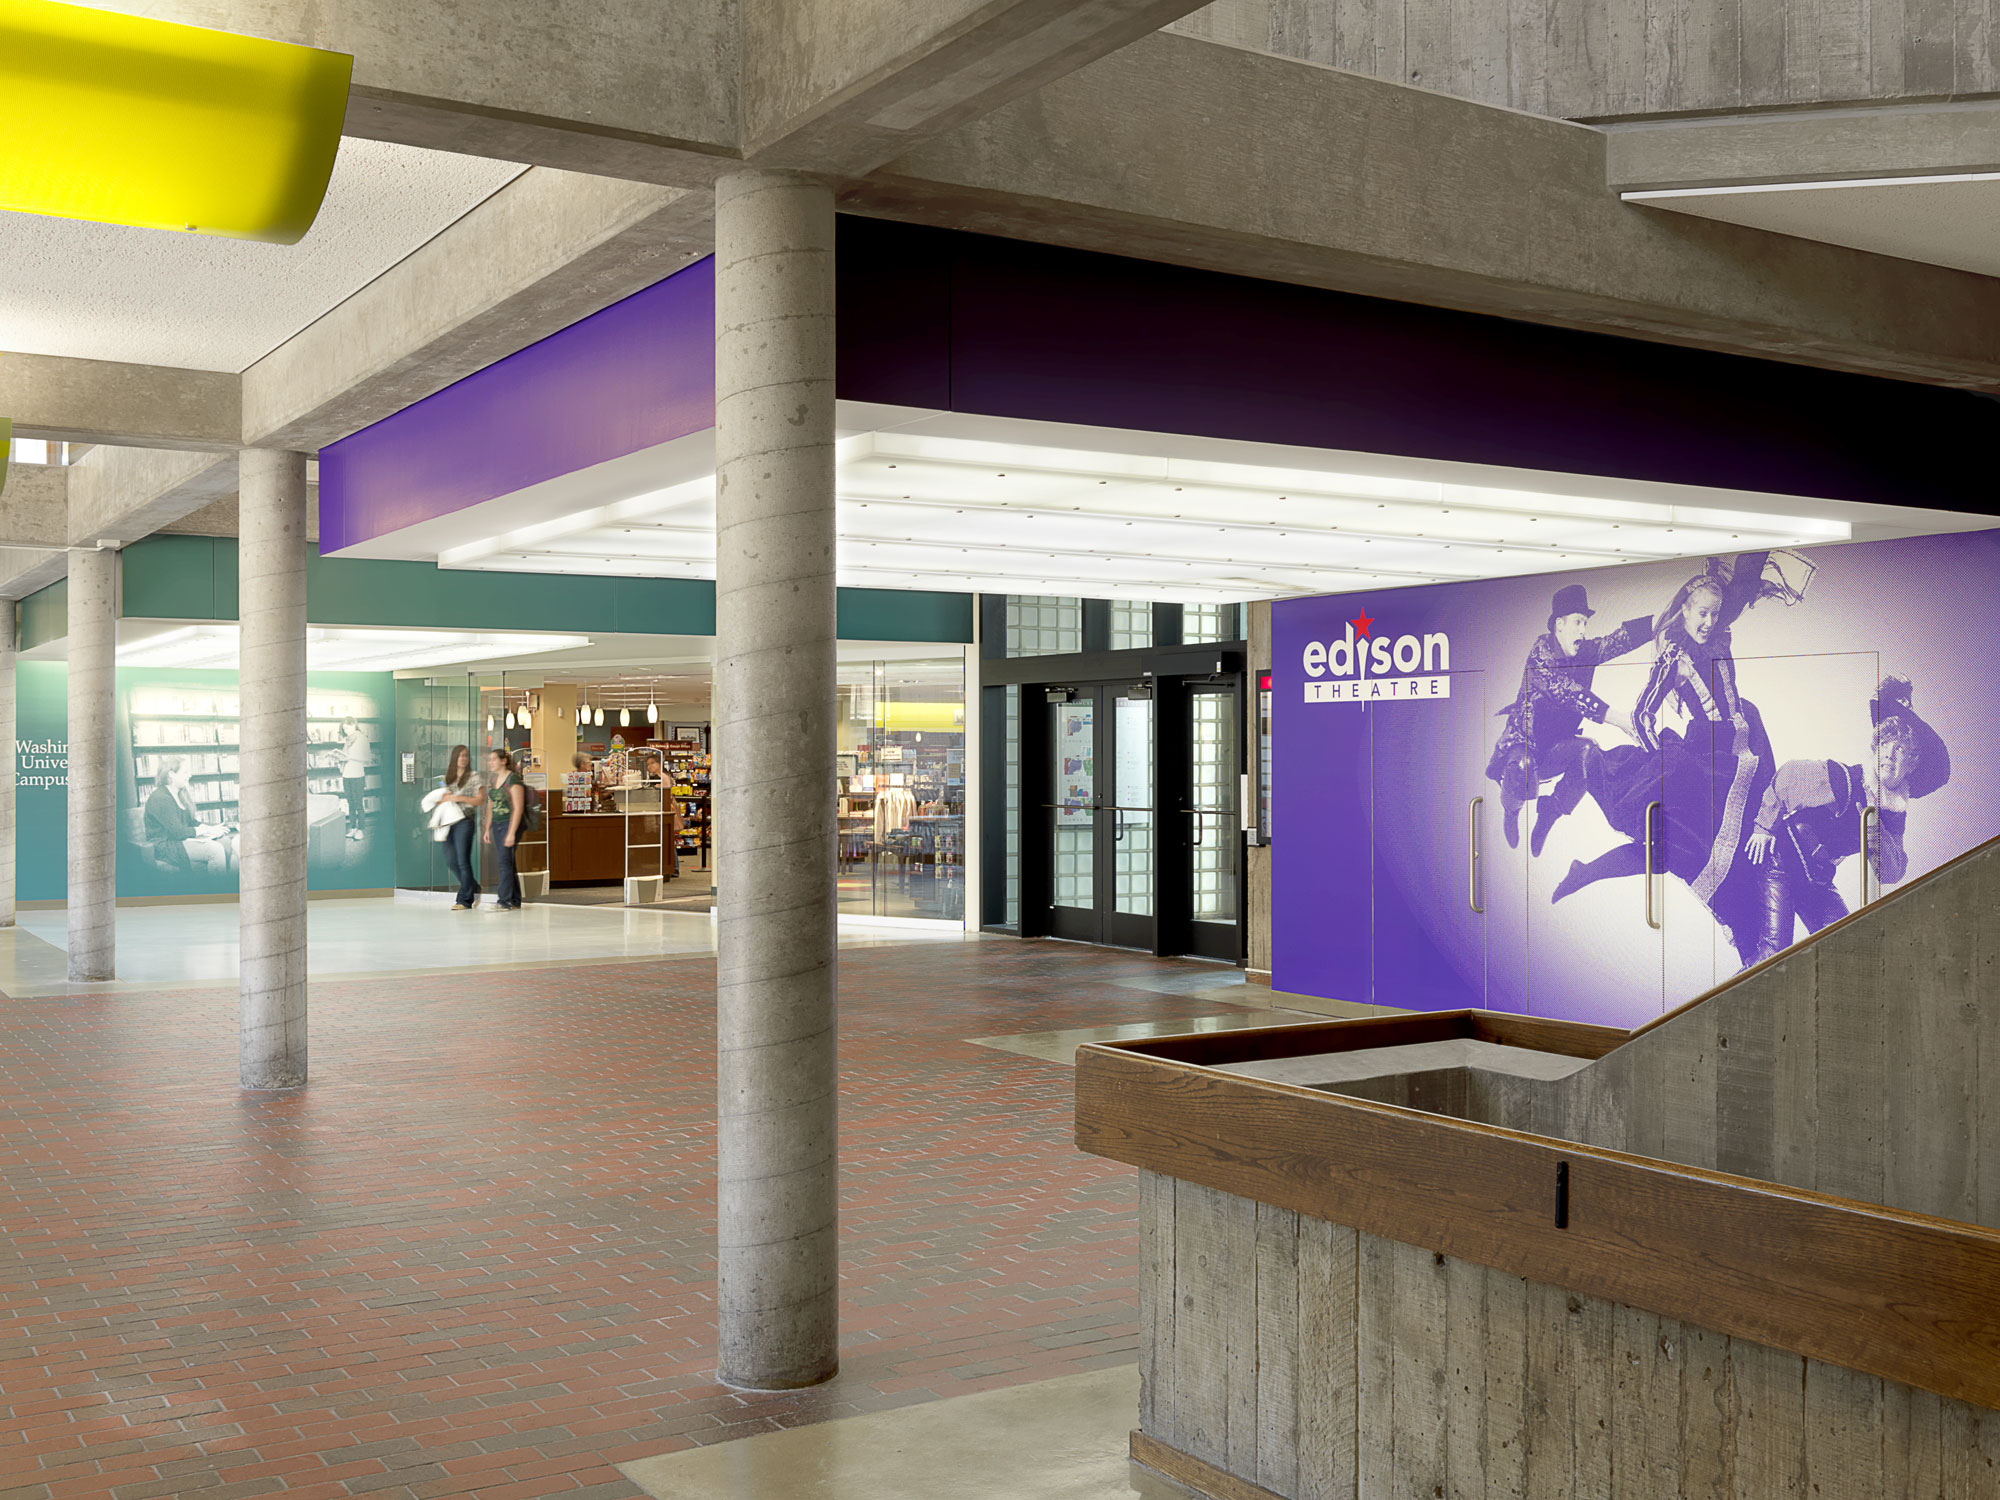 Washington University Mallinckrodt Center | PARIC